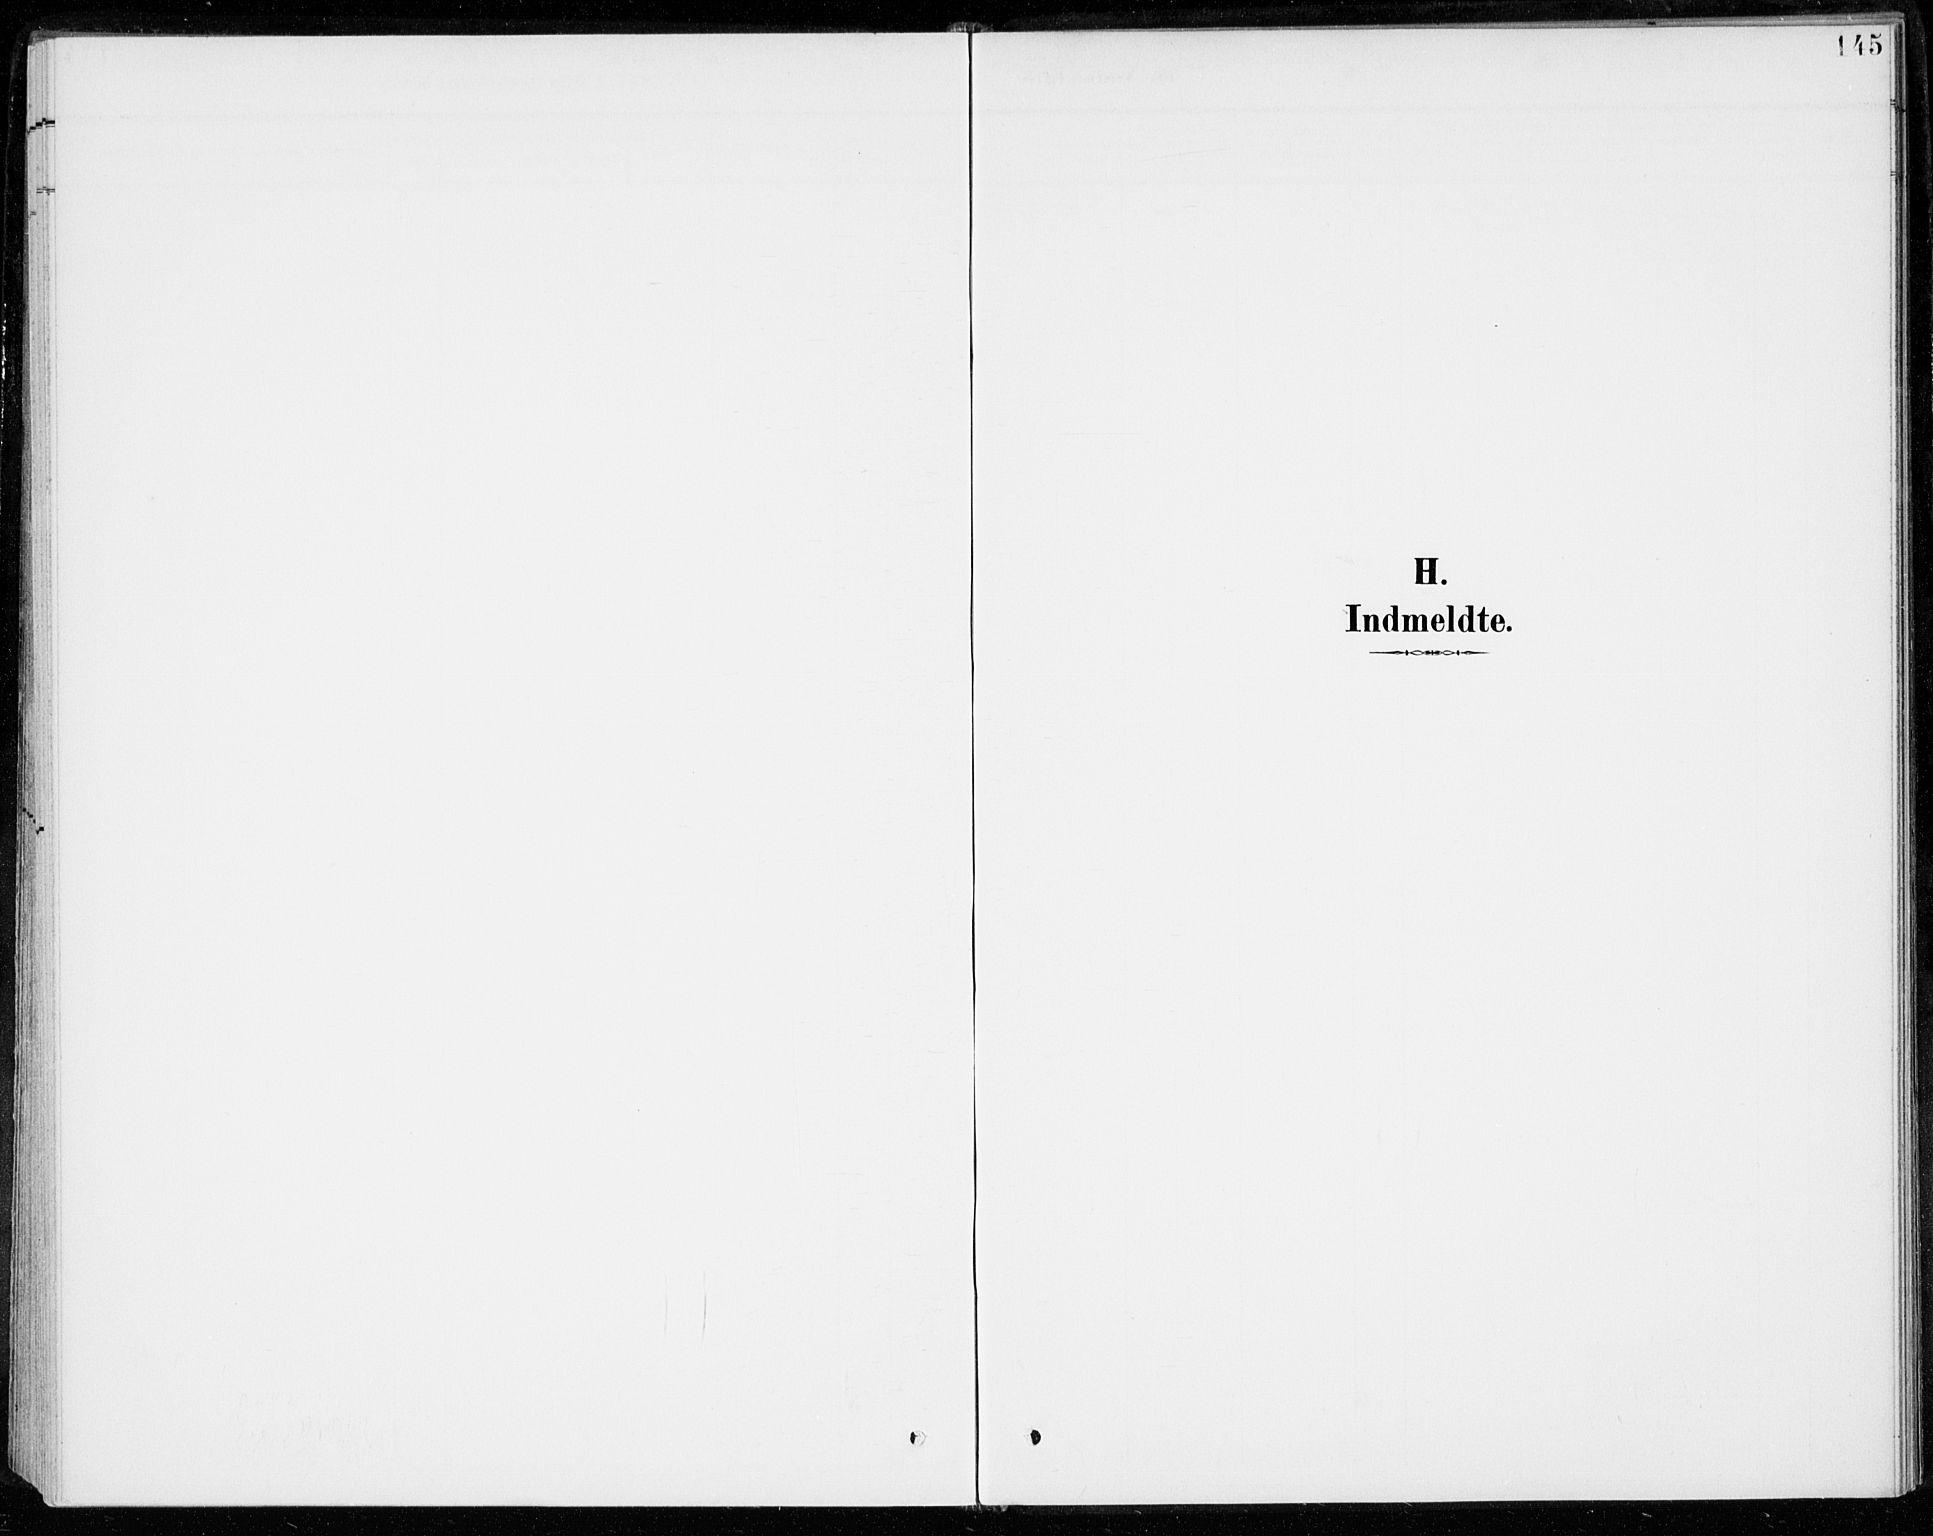 SAKO, Sigdal kirkebøker, F/Fc/L0002: Ministerialbok nr. III 2, 1894-1911, s. 145